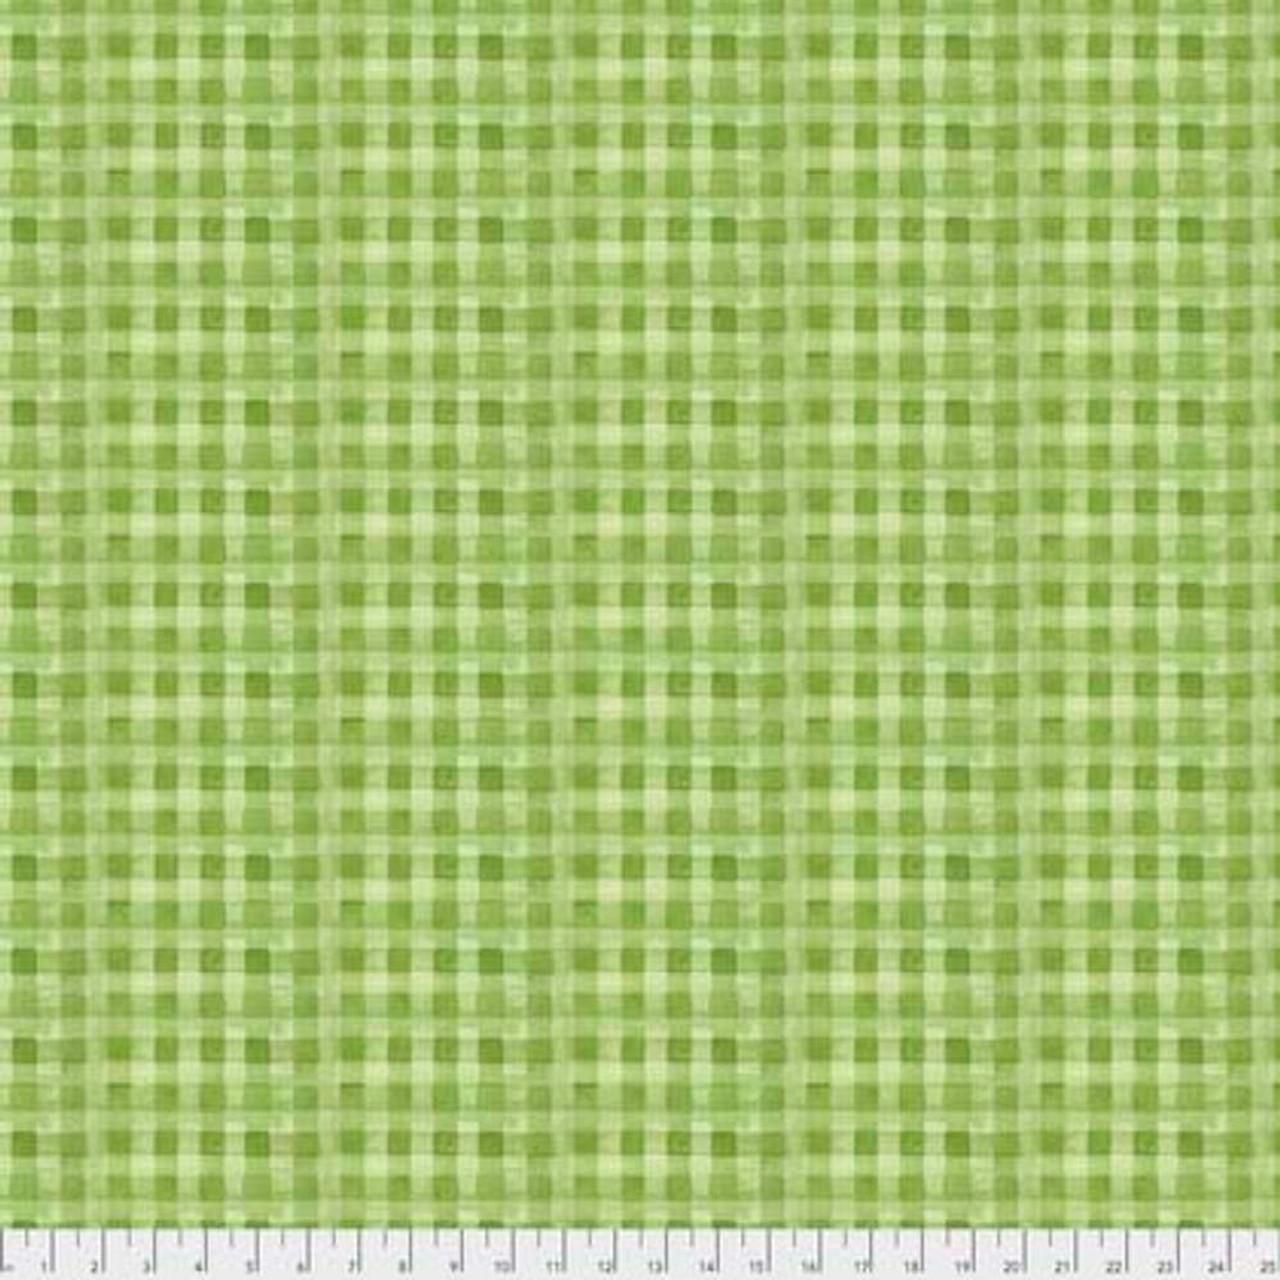 "Sliced Cut GreenTurbo Shells~1/""-1-1//2/""~ Seashell Craft Select 10//20//30 Pcs."